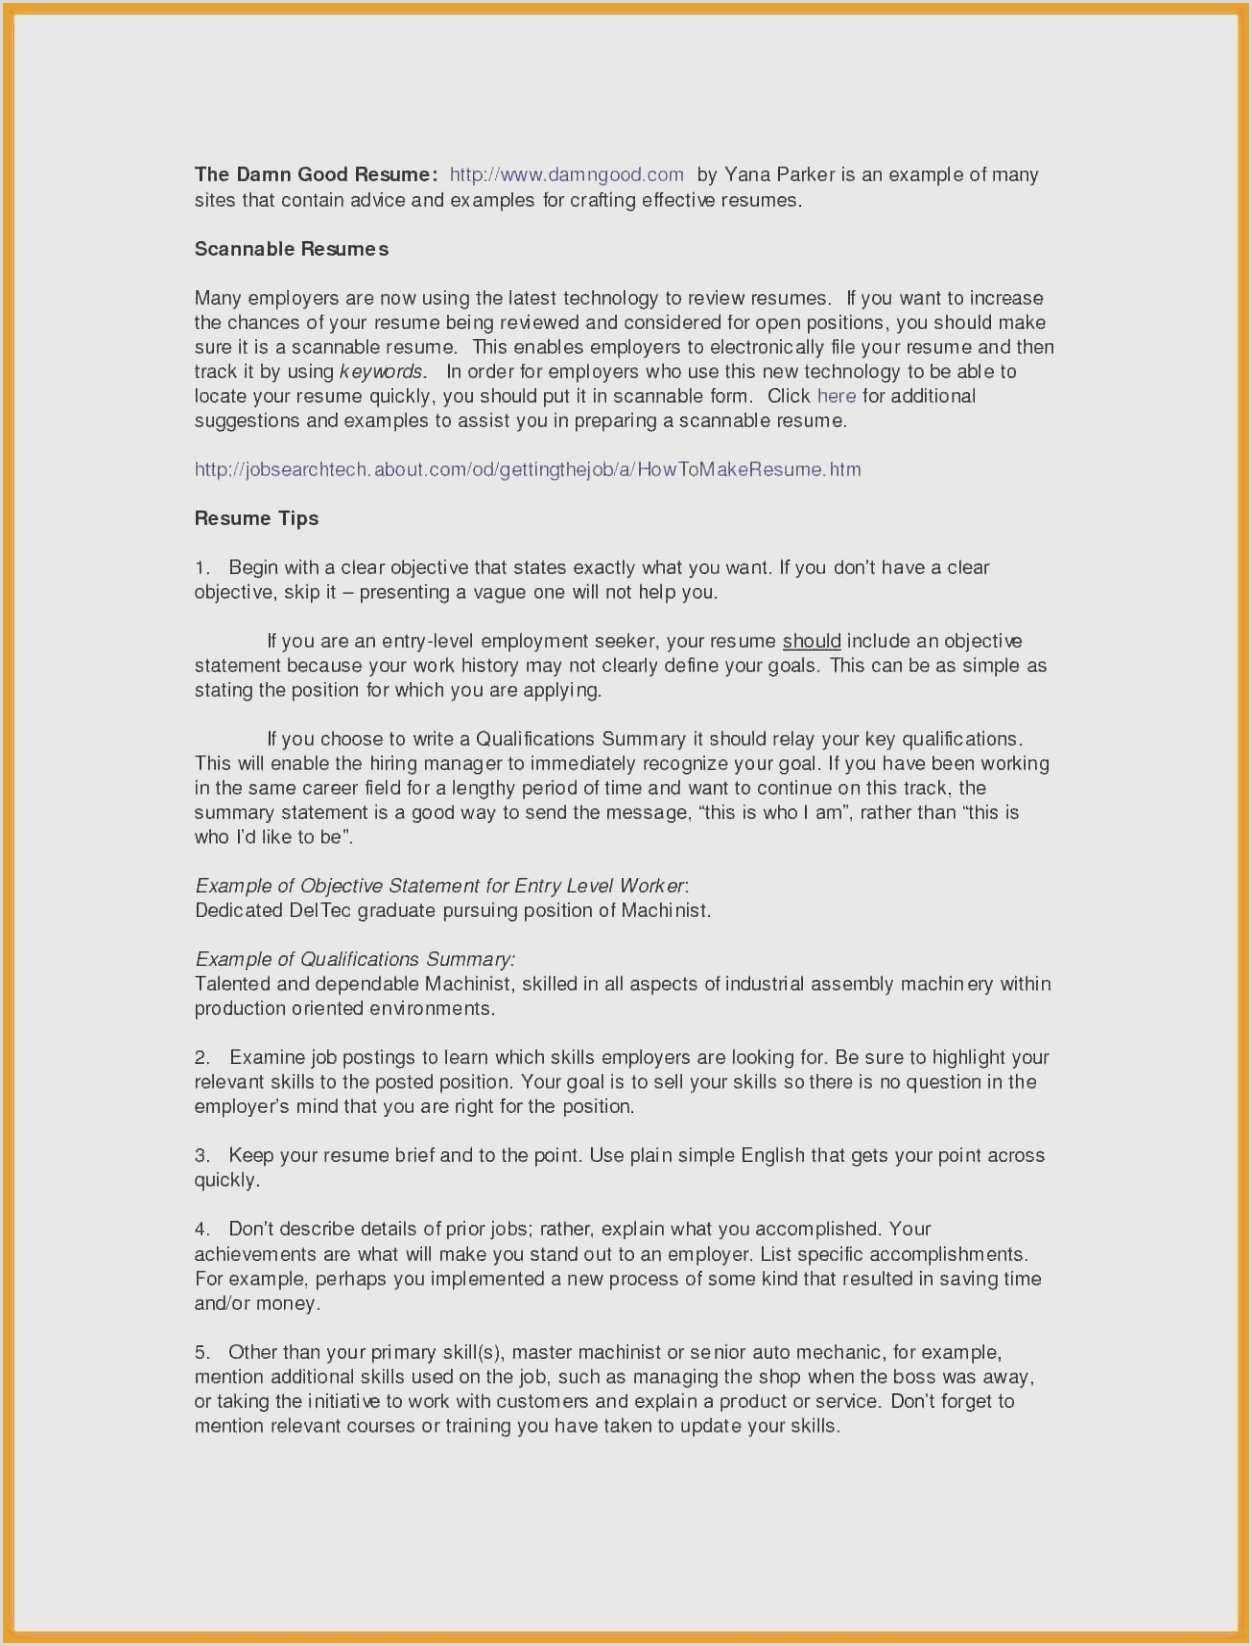 Hair Stylist Resume Samples Hair Stylist Resume Examples Simple T Resume Mla format